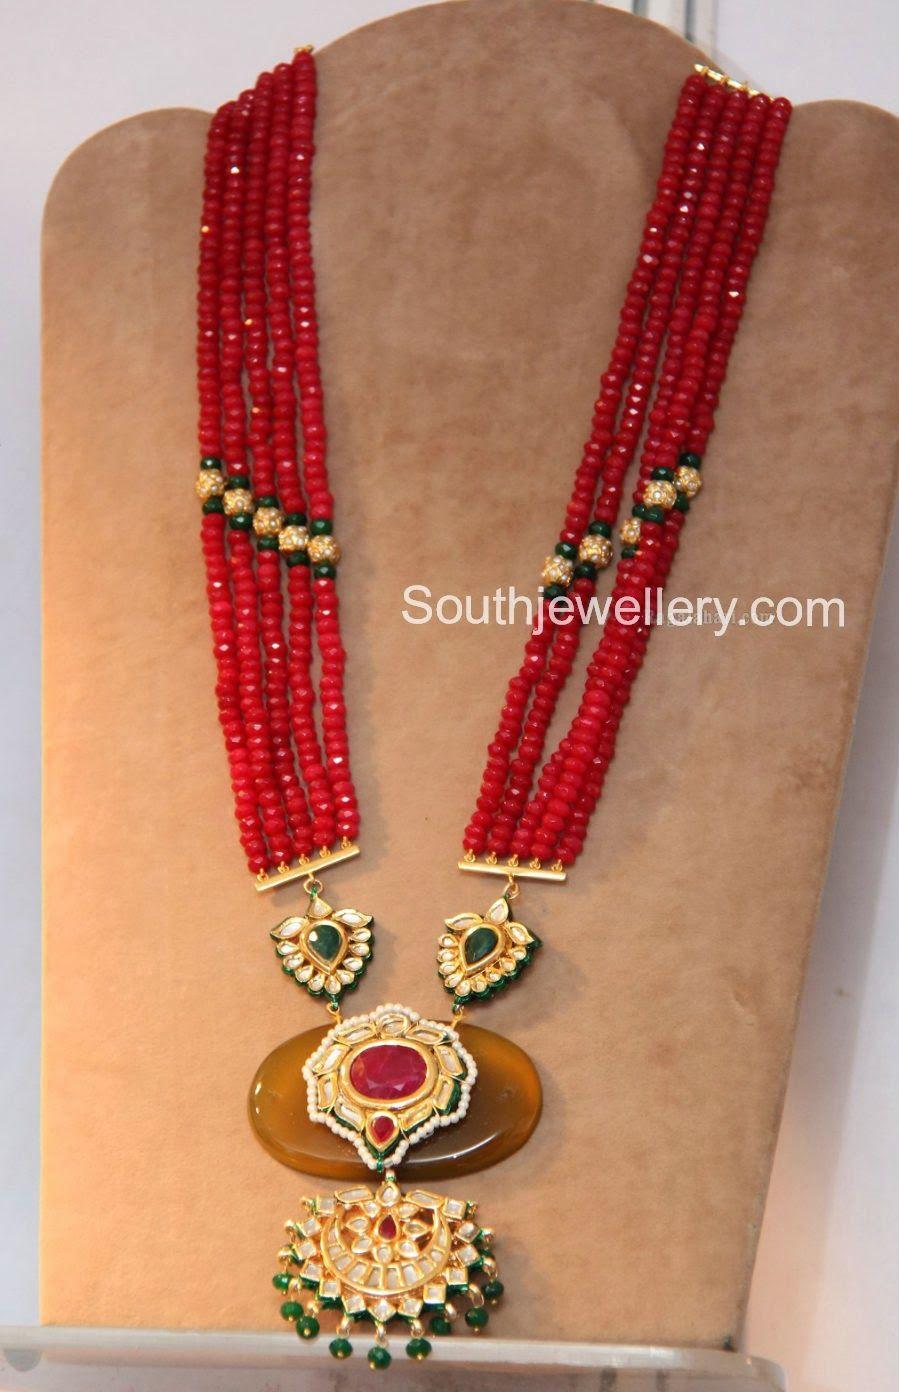 Beaded Fashion Jewellery ~ Latest Jewellery Designs | Jewelry ...